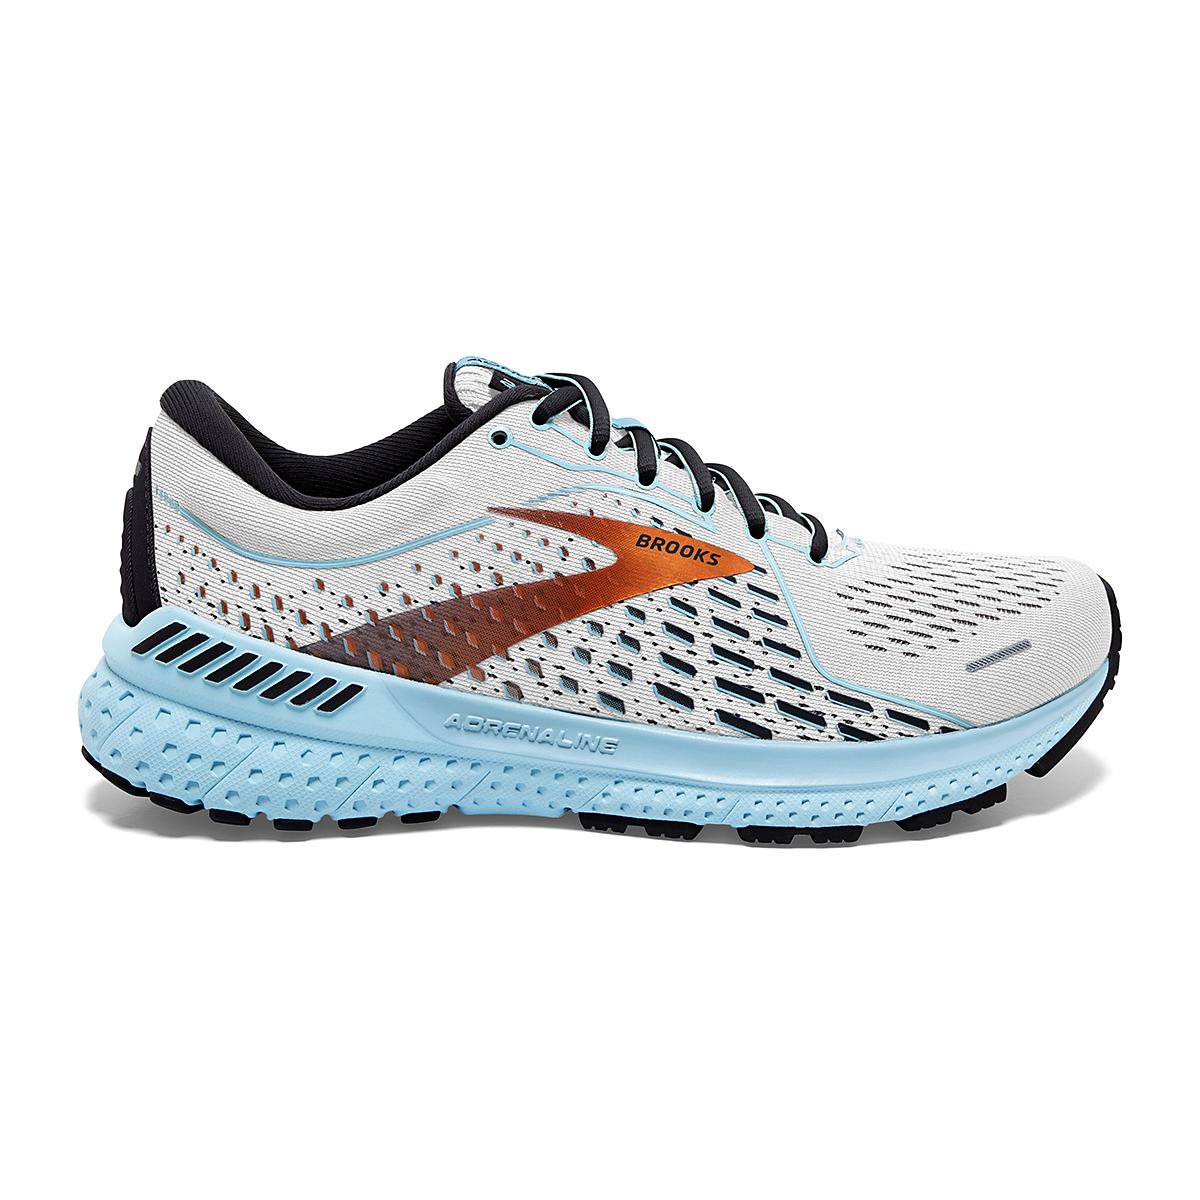 Women's Brooks Adrenaline GTS 21 Running Shoe - Color: White/Alloy - Size: 5 - Width: Regular, White/Alloy, large, image 1